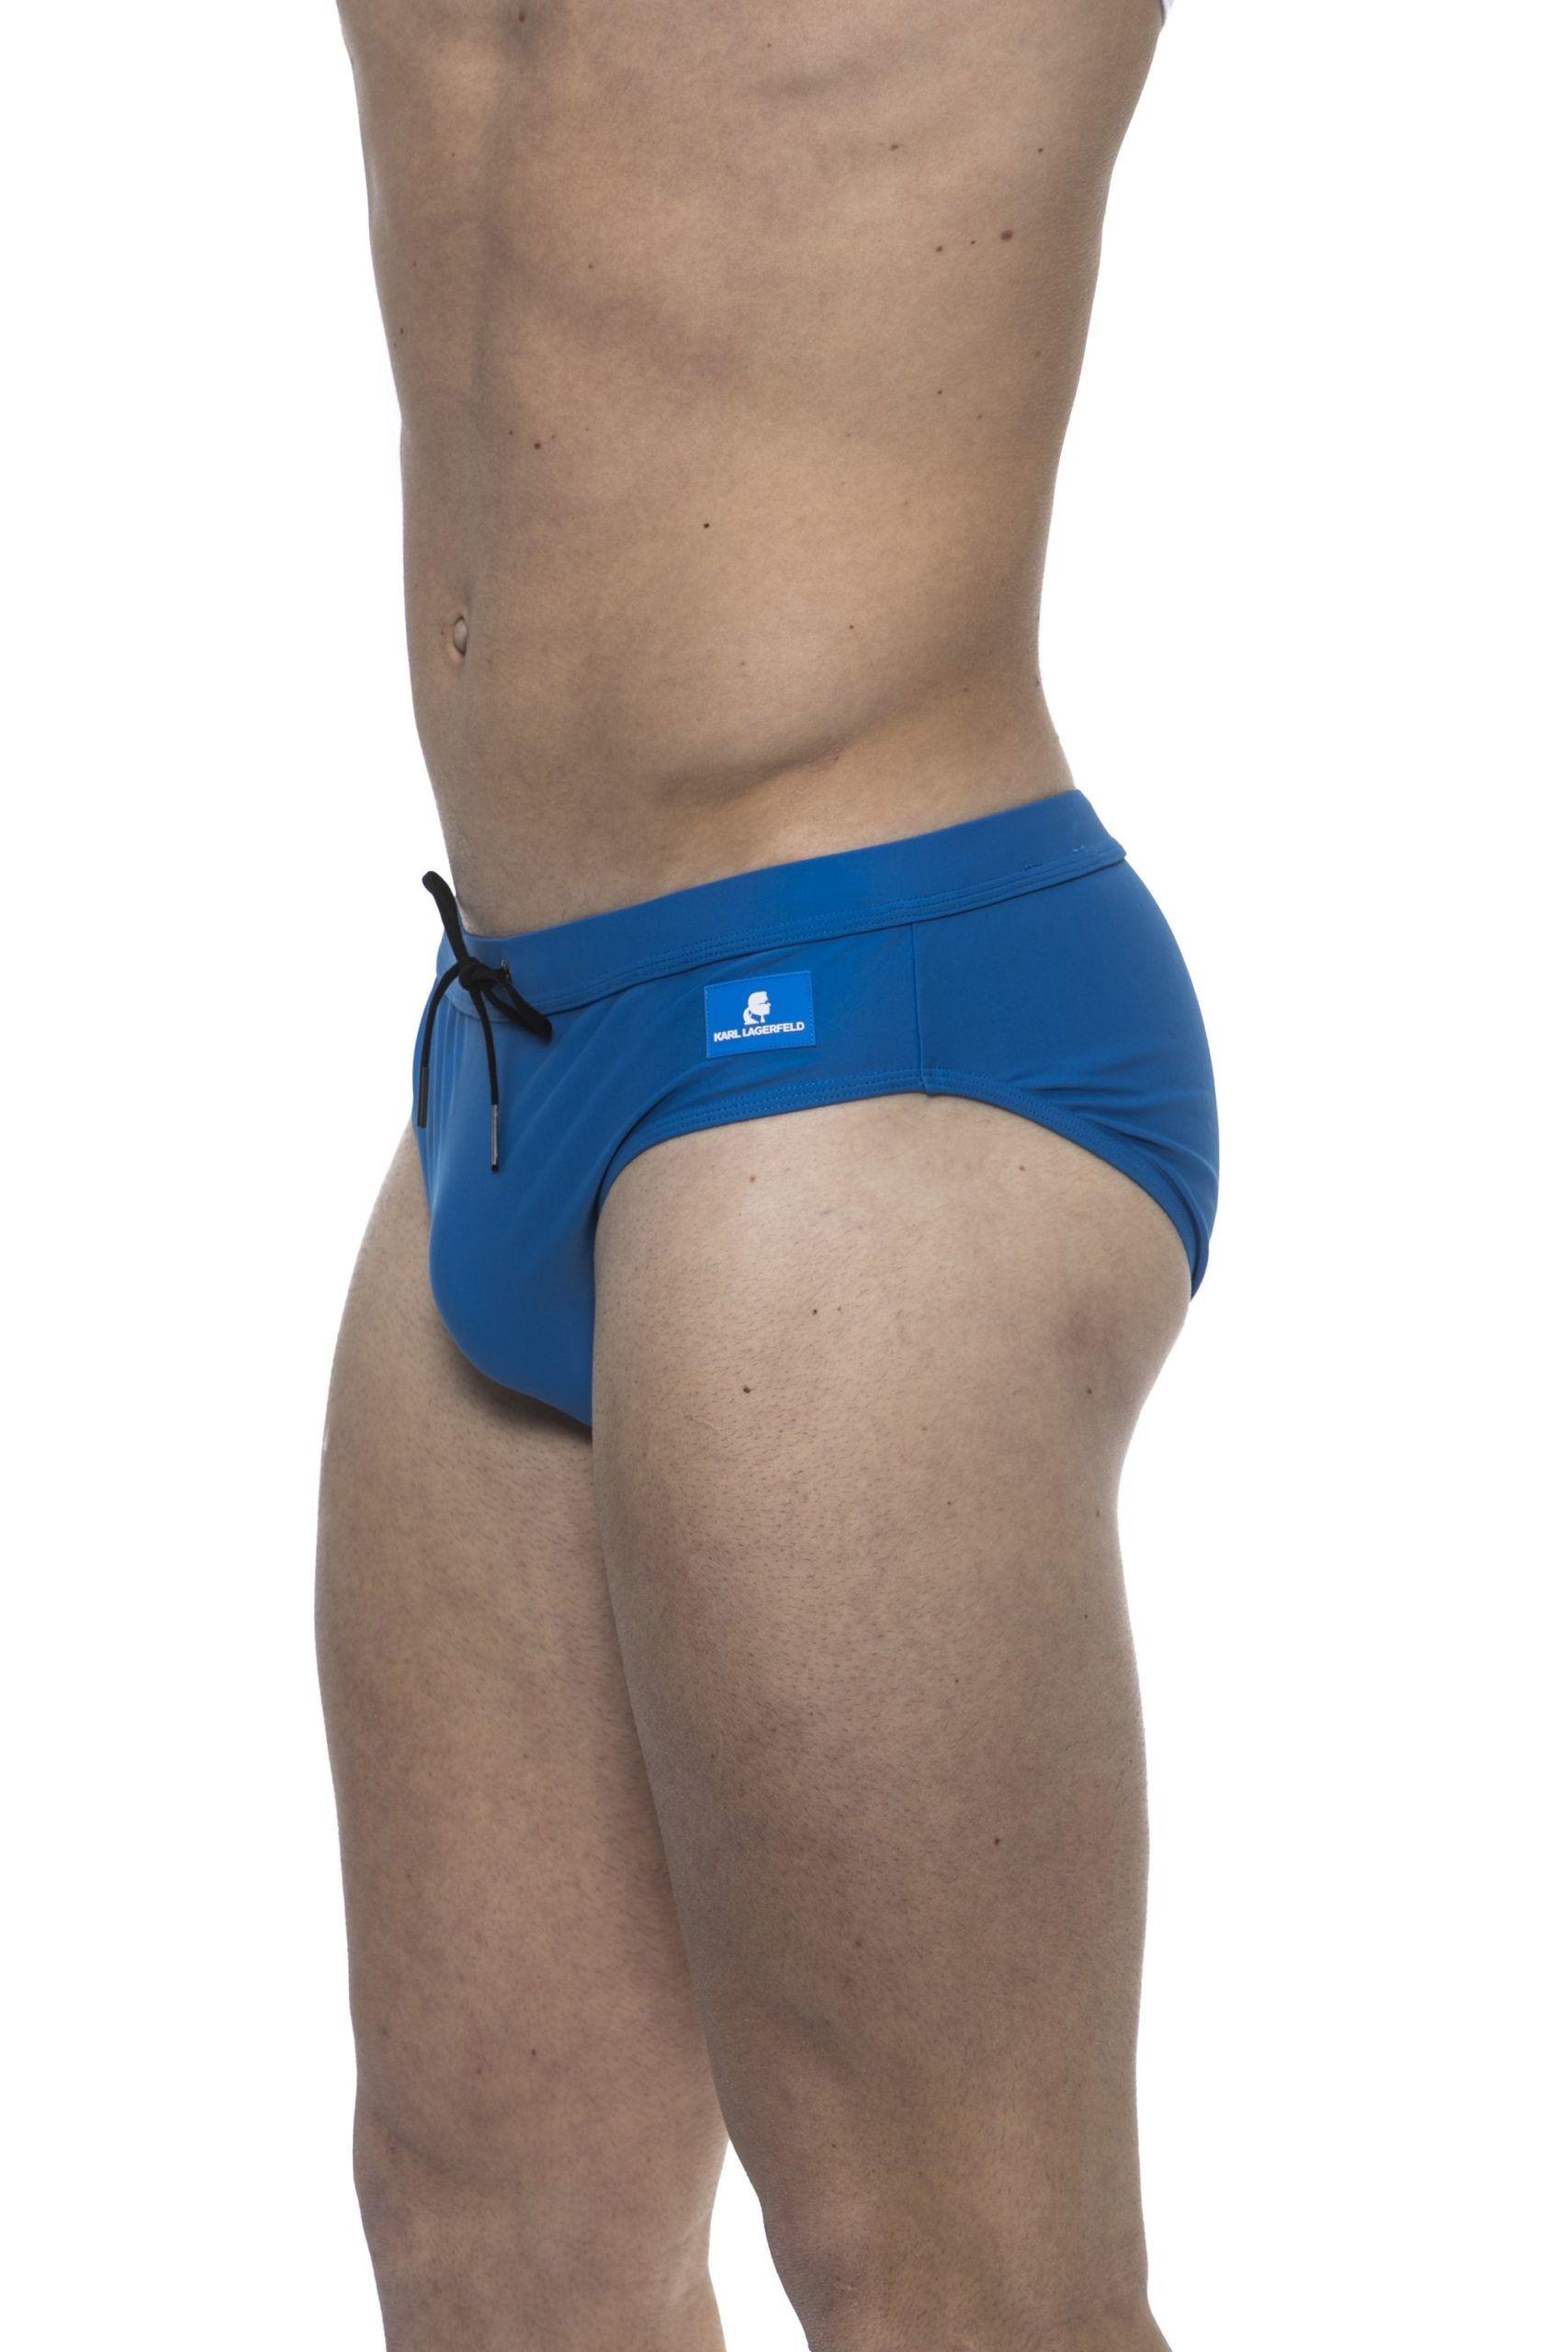 Karl Lagerfeld Blu Navy Swimwear